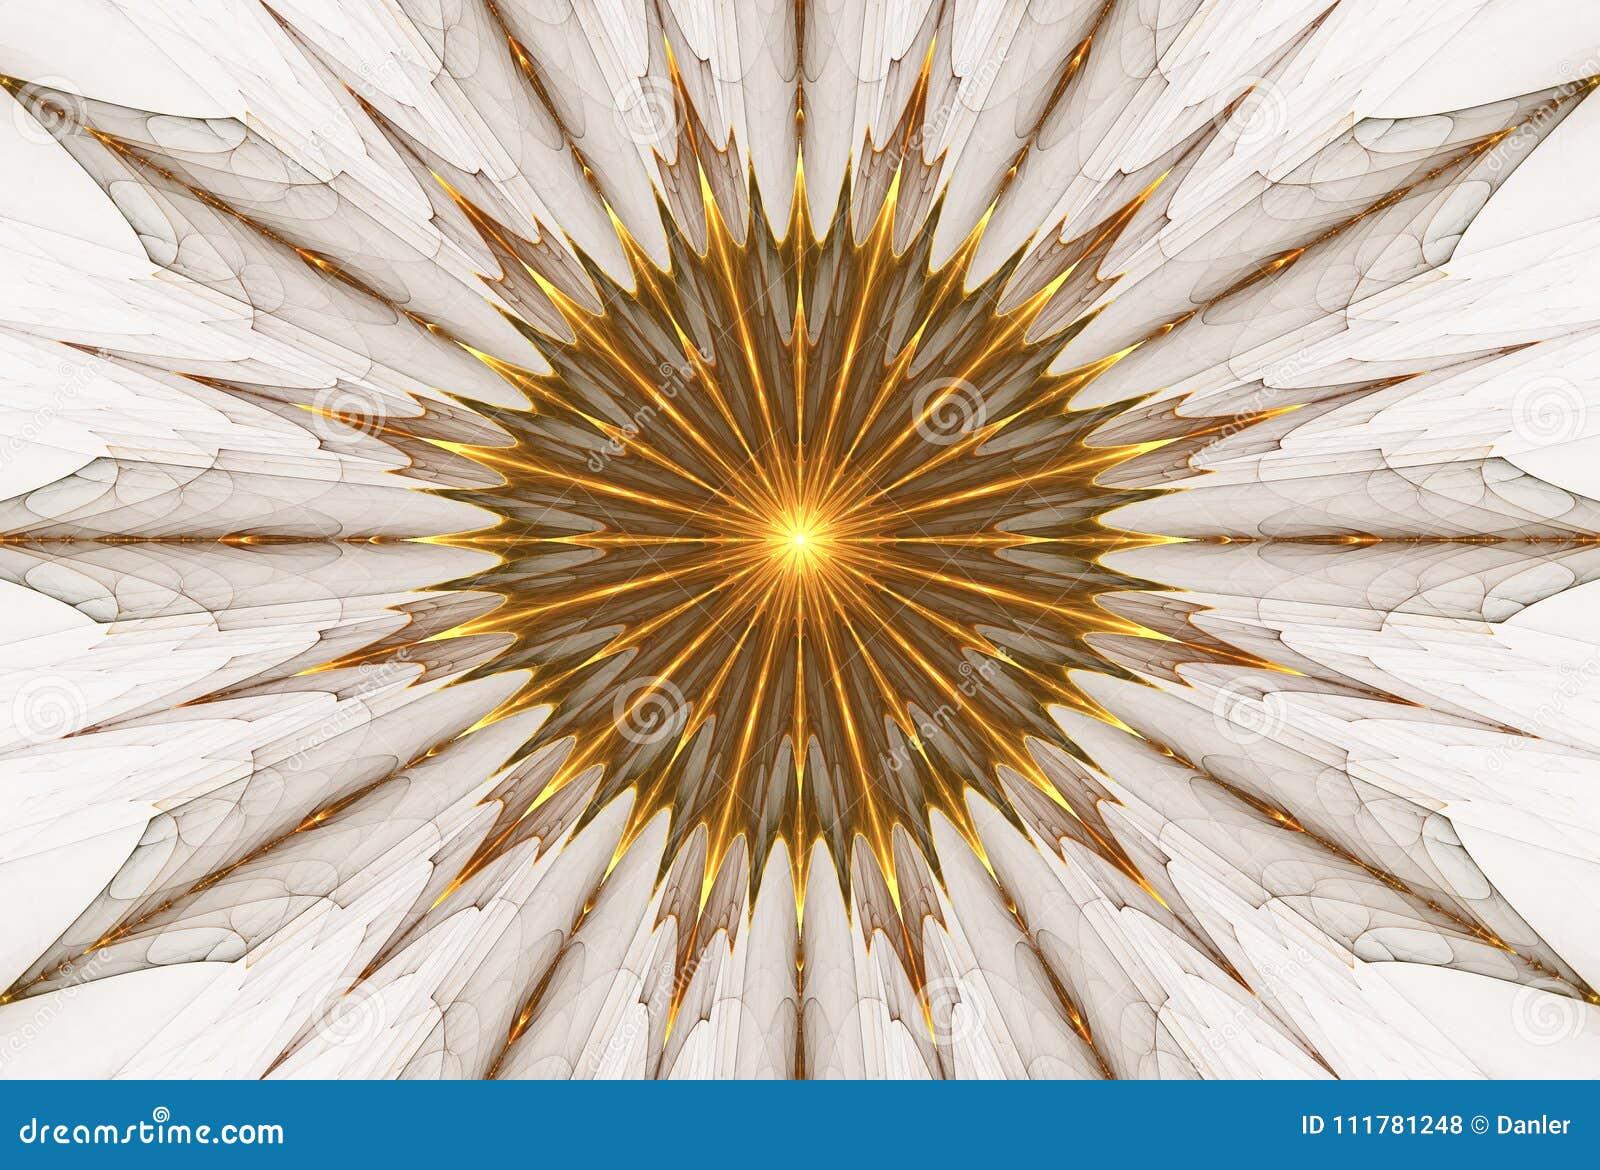 Fractal sun fantasy